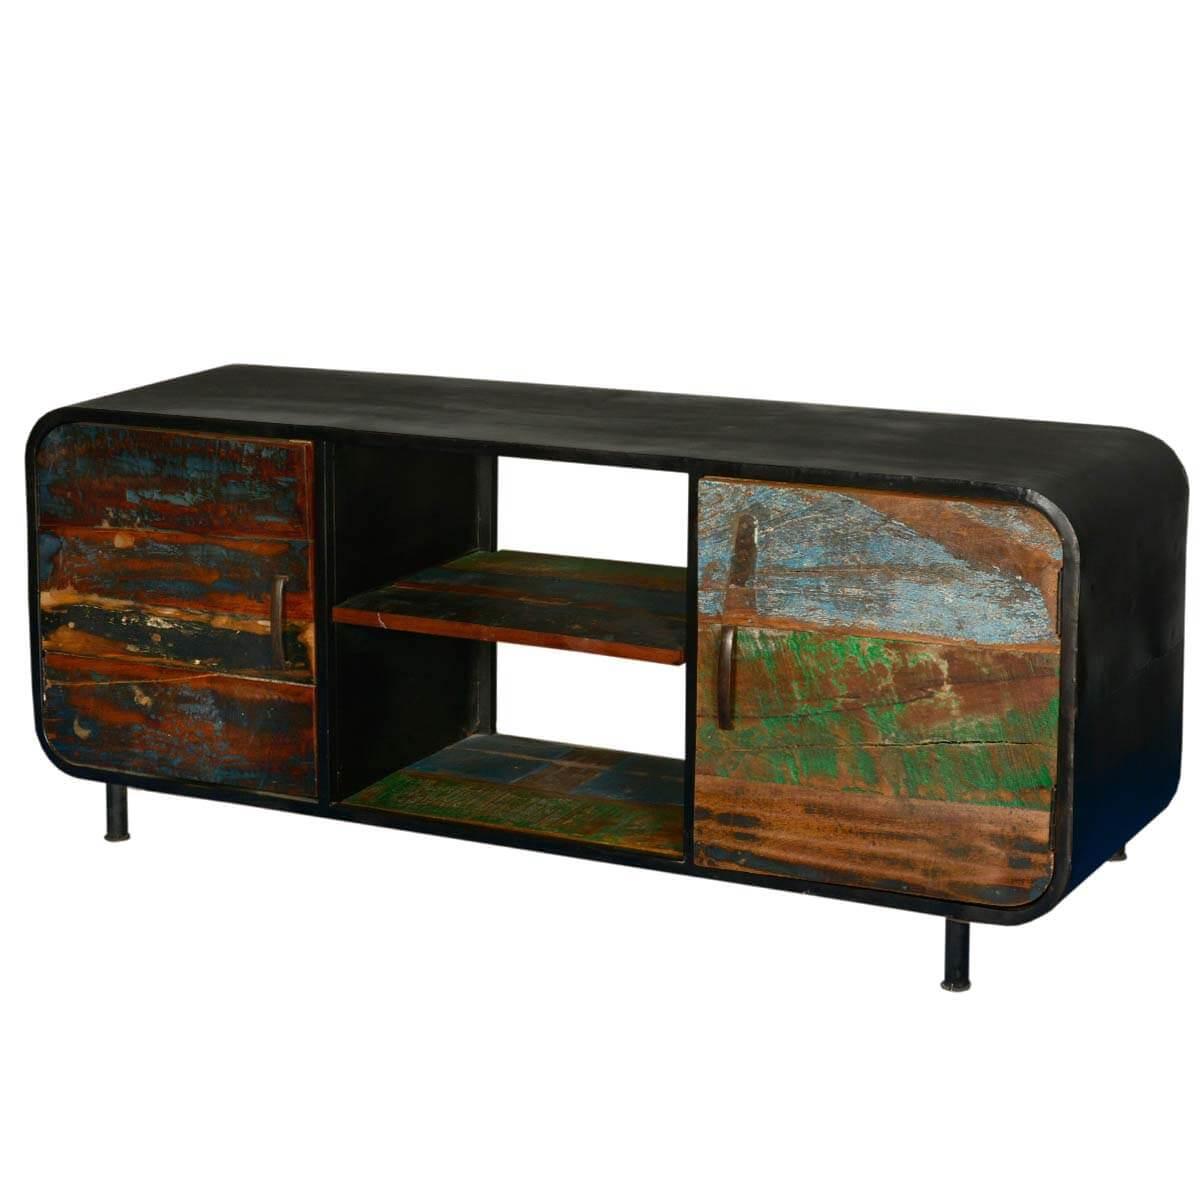 Retro Reclaimed Wood & Iron Media Console Cabinet